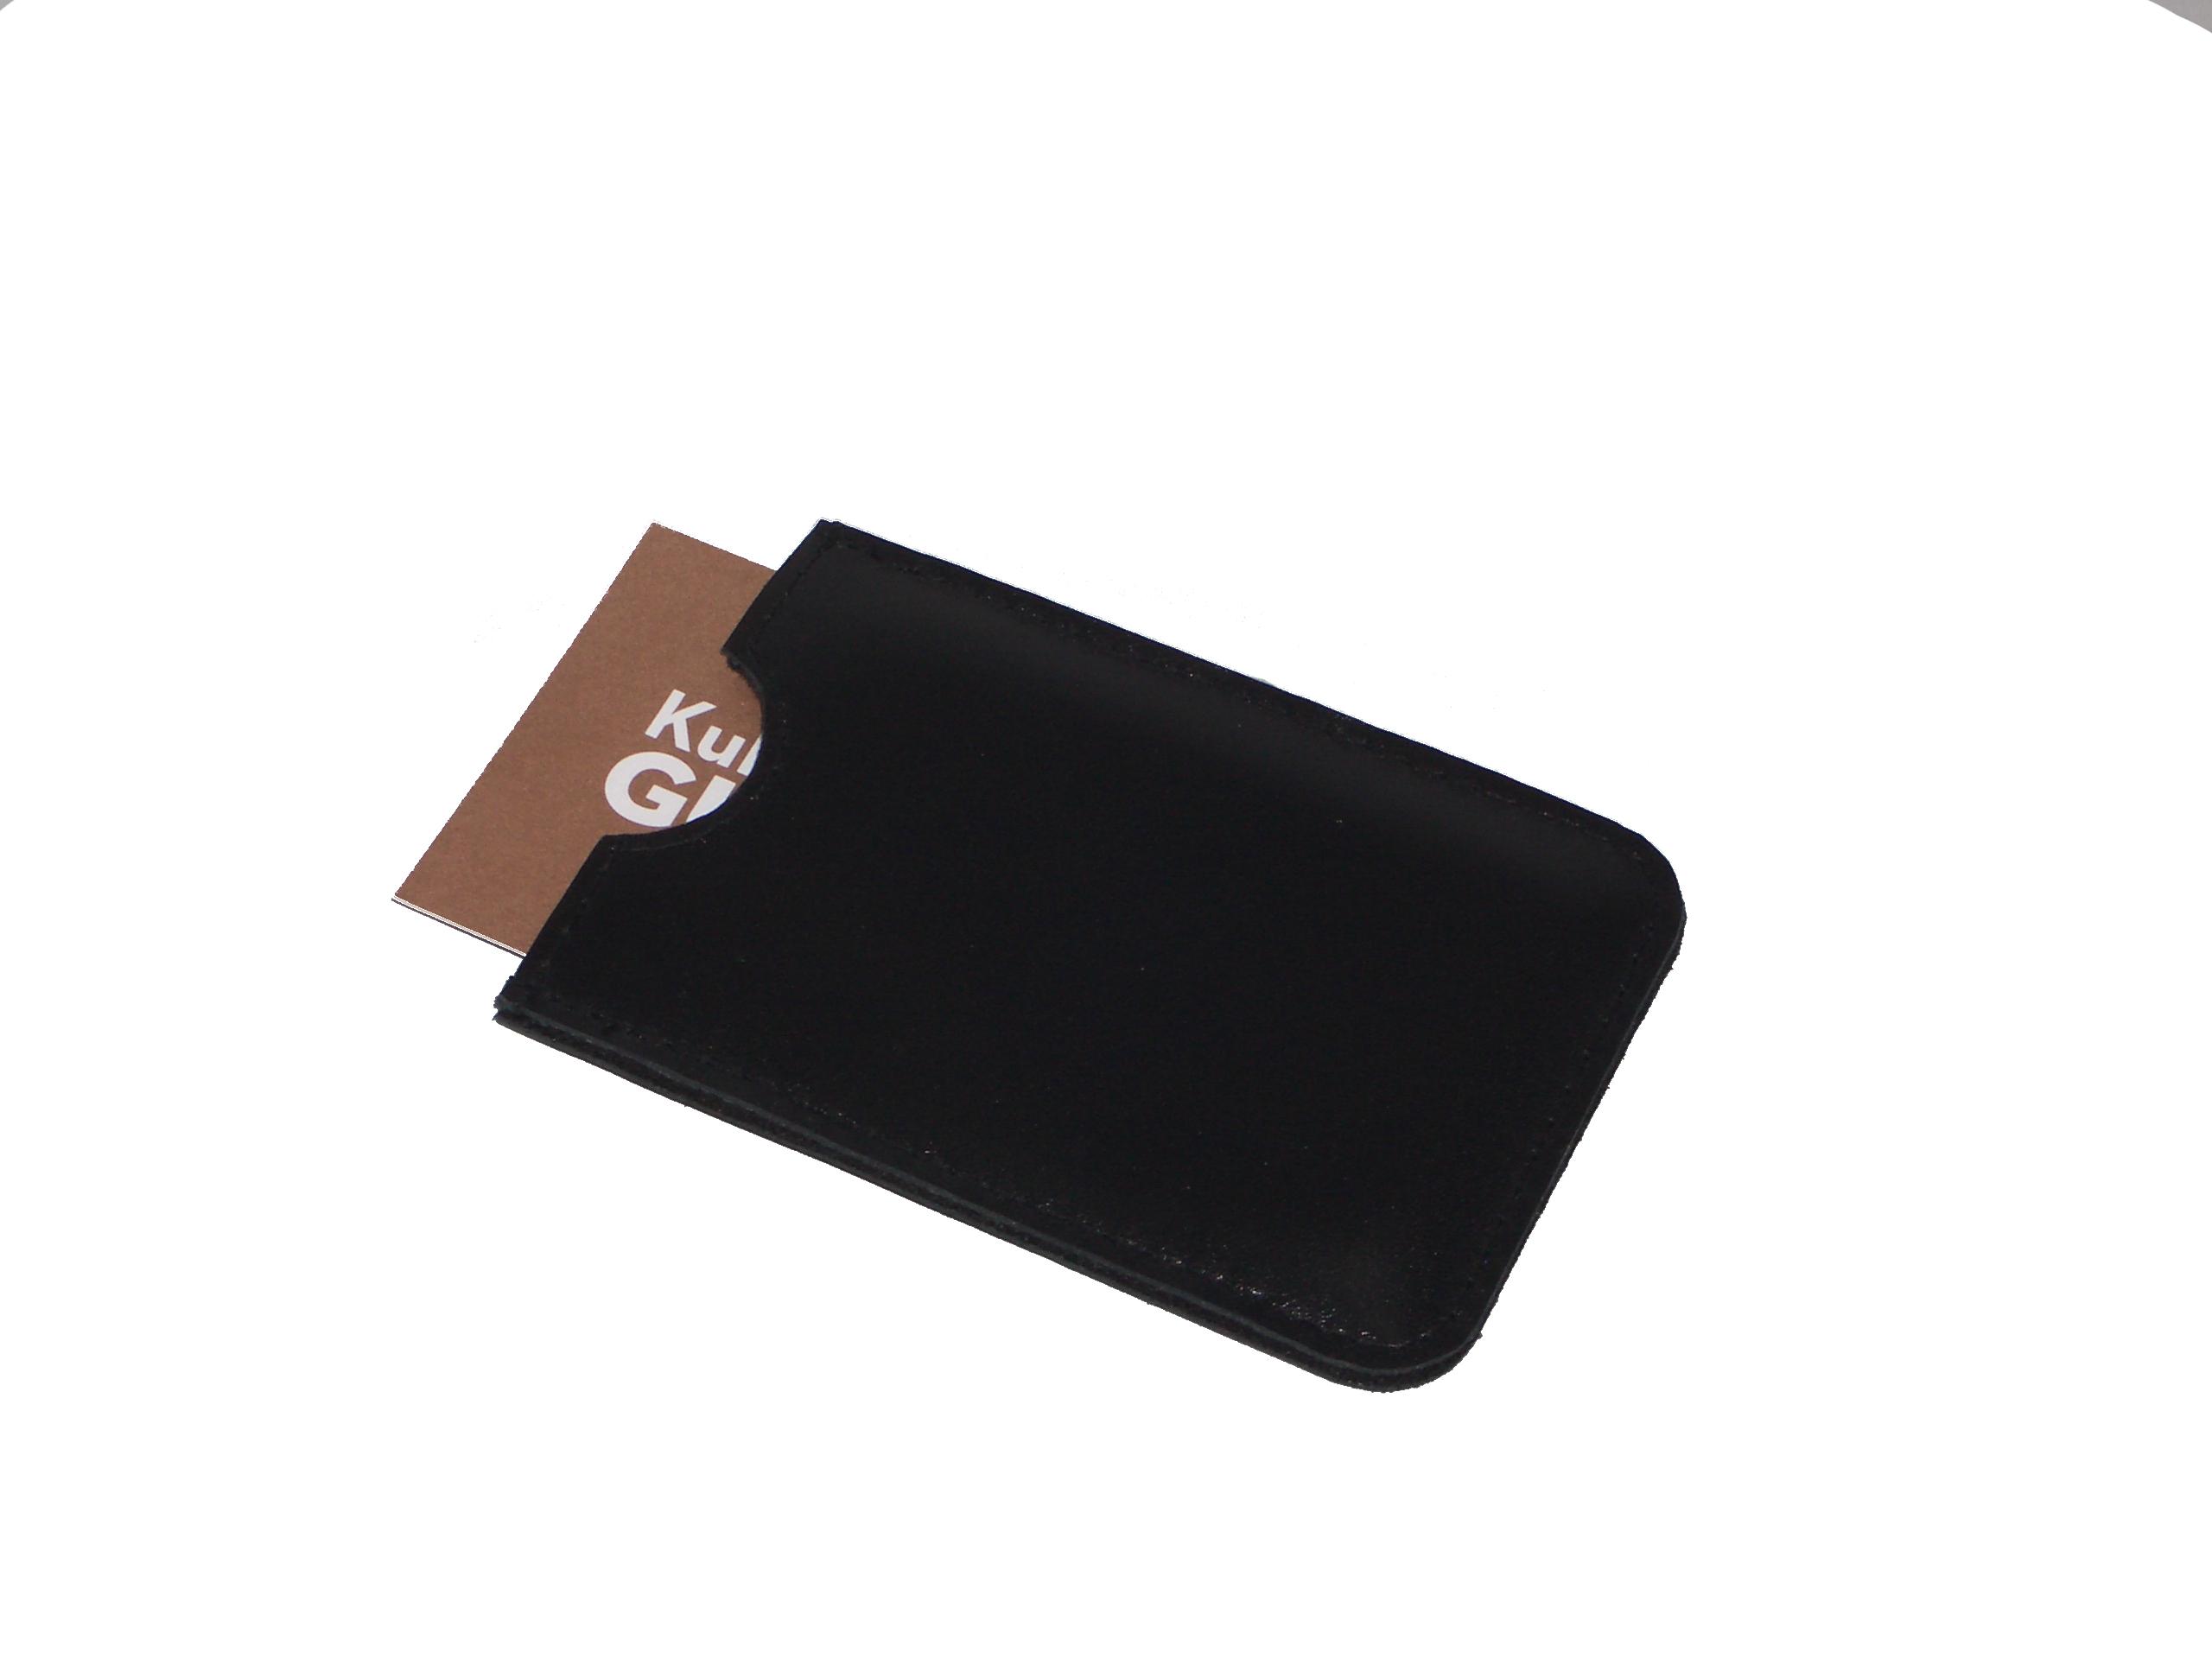 Leather Case For Business Cards Black Black